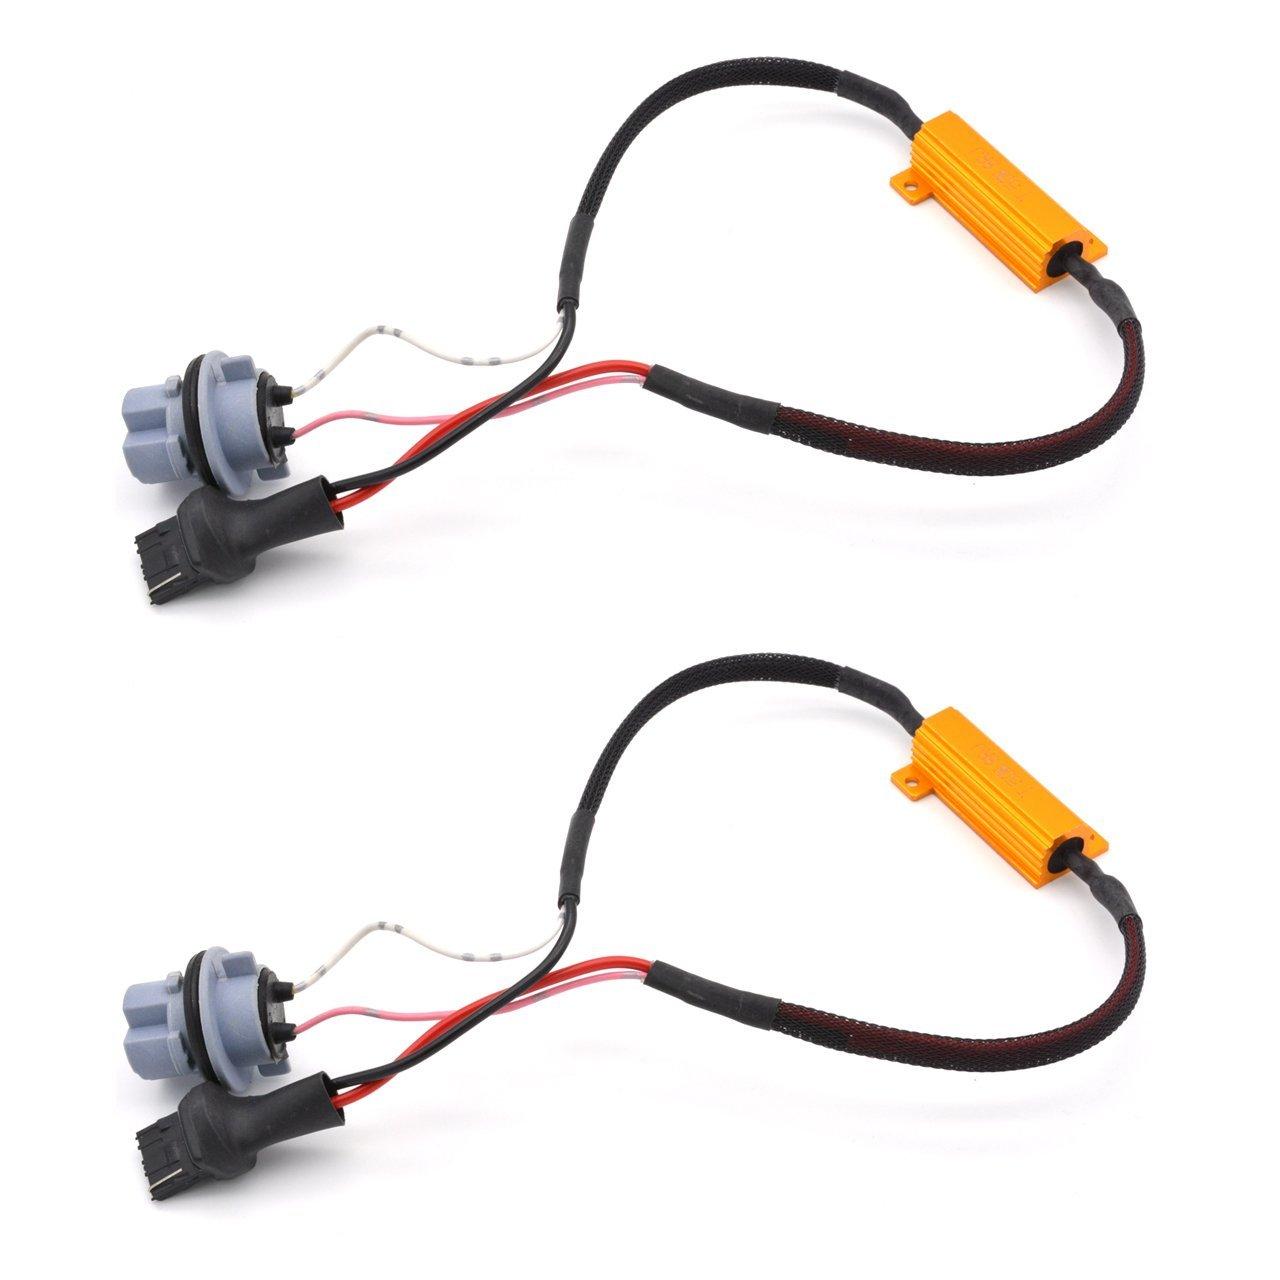 2pcs 50W 8ohm 7440 Led Load Resistors Connector Fix Turn Signal Bulb DRL Error Free Decoder